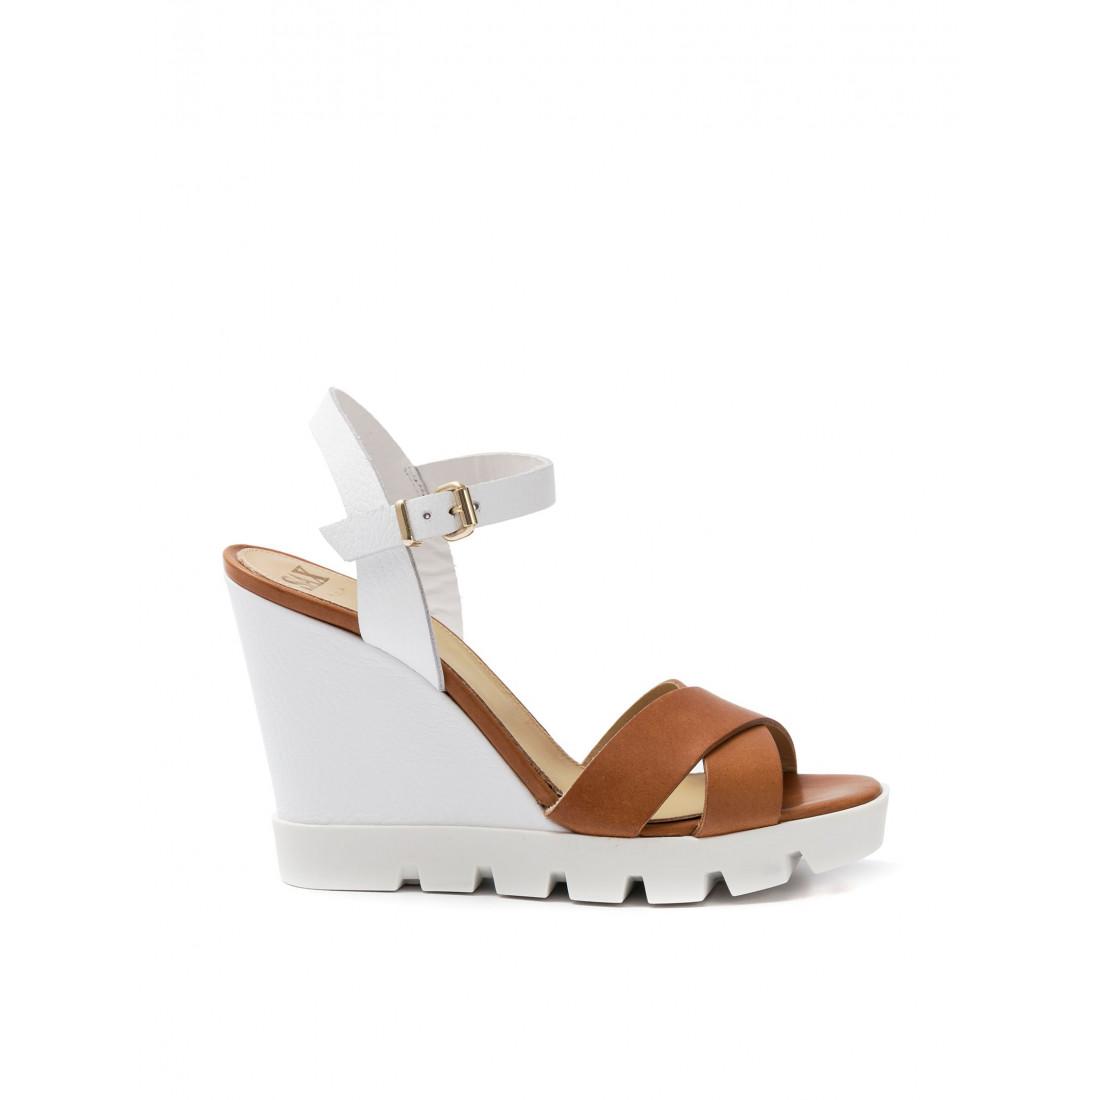 sandals woman sax 27701 bima maine cuoio 530